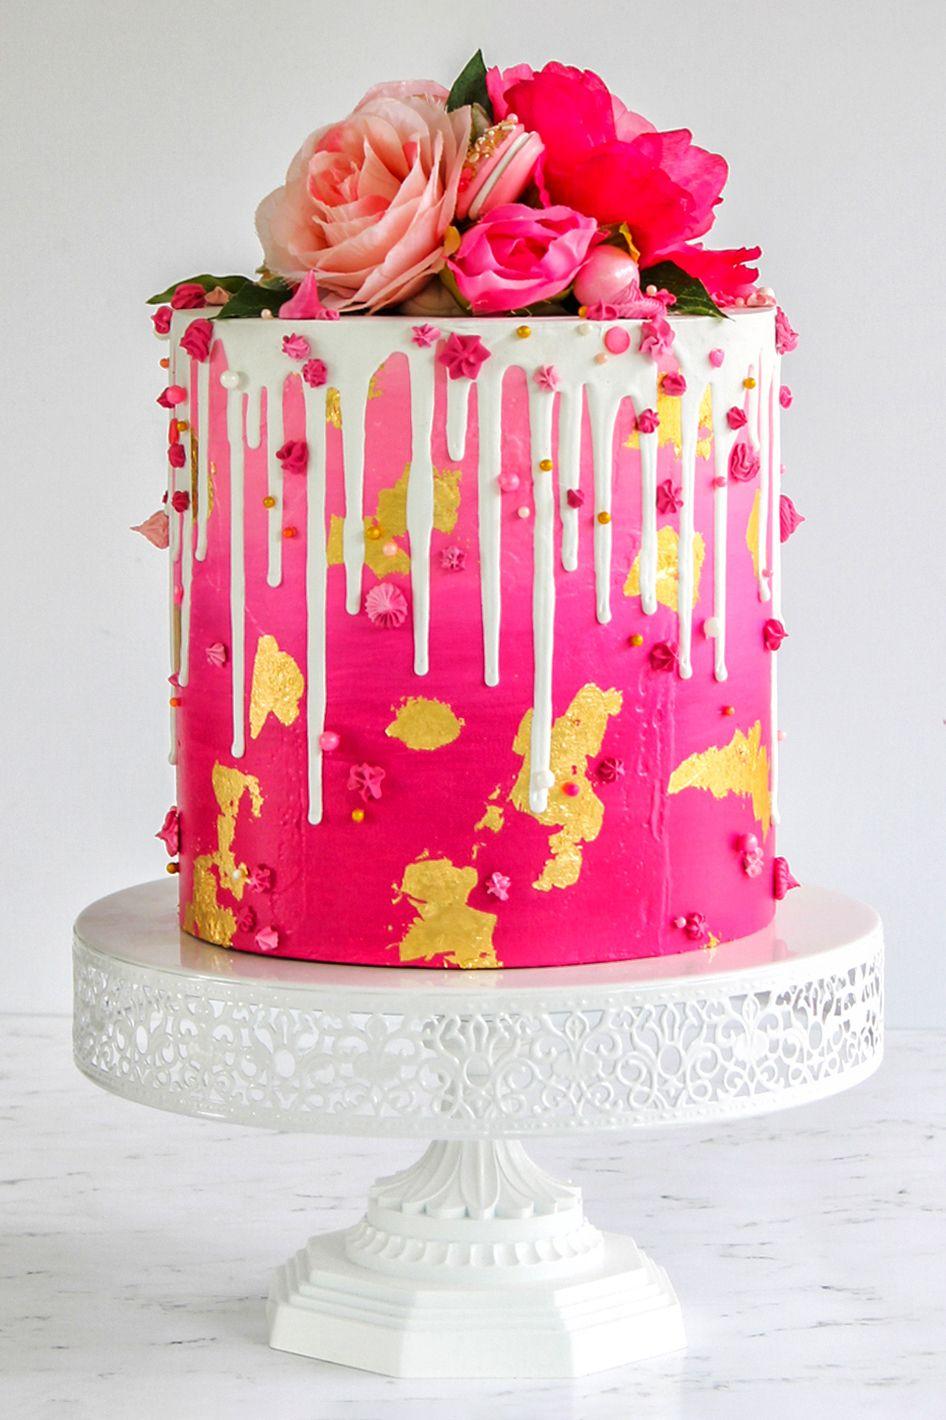 12 inch round metal wedding cake stand white hot pink